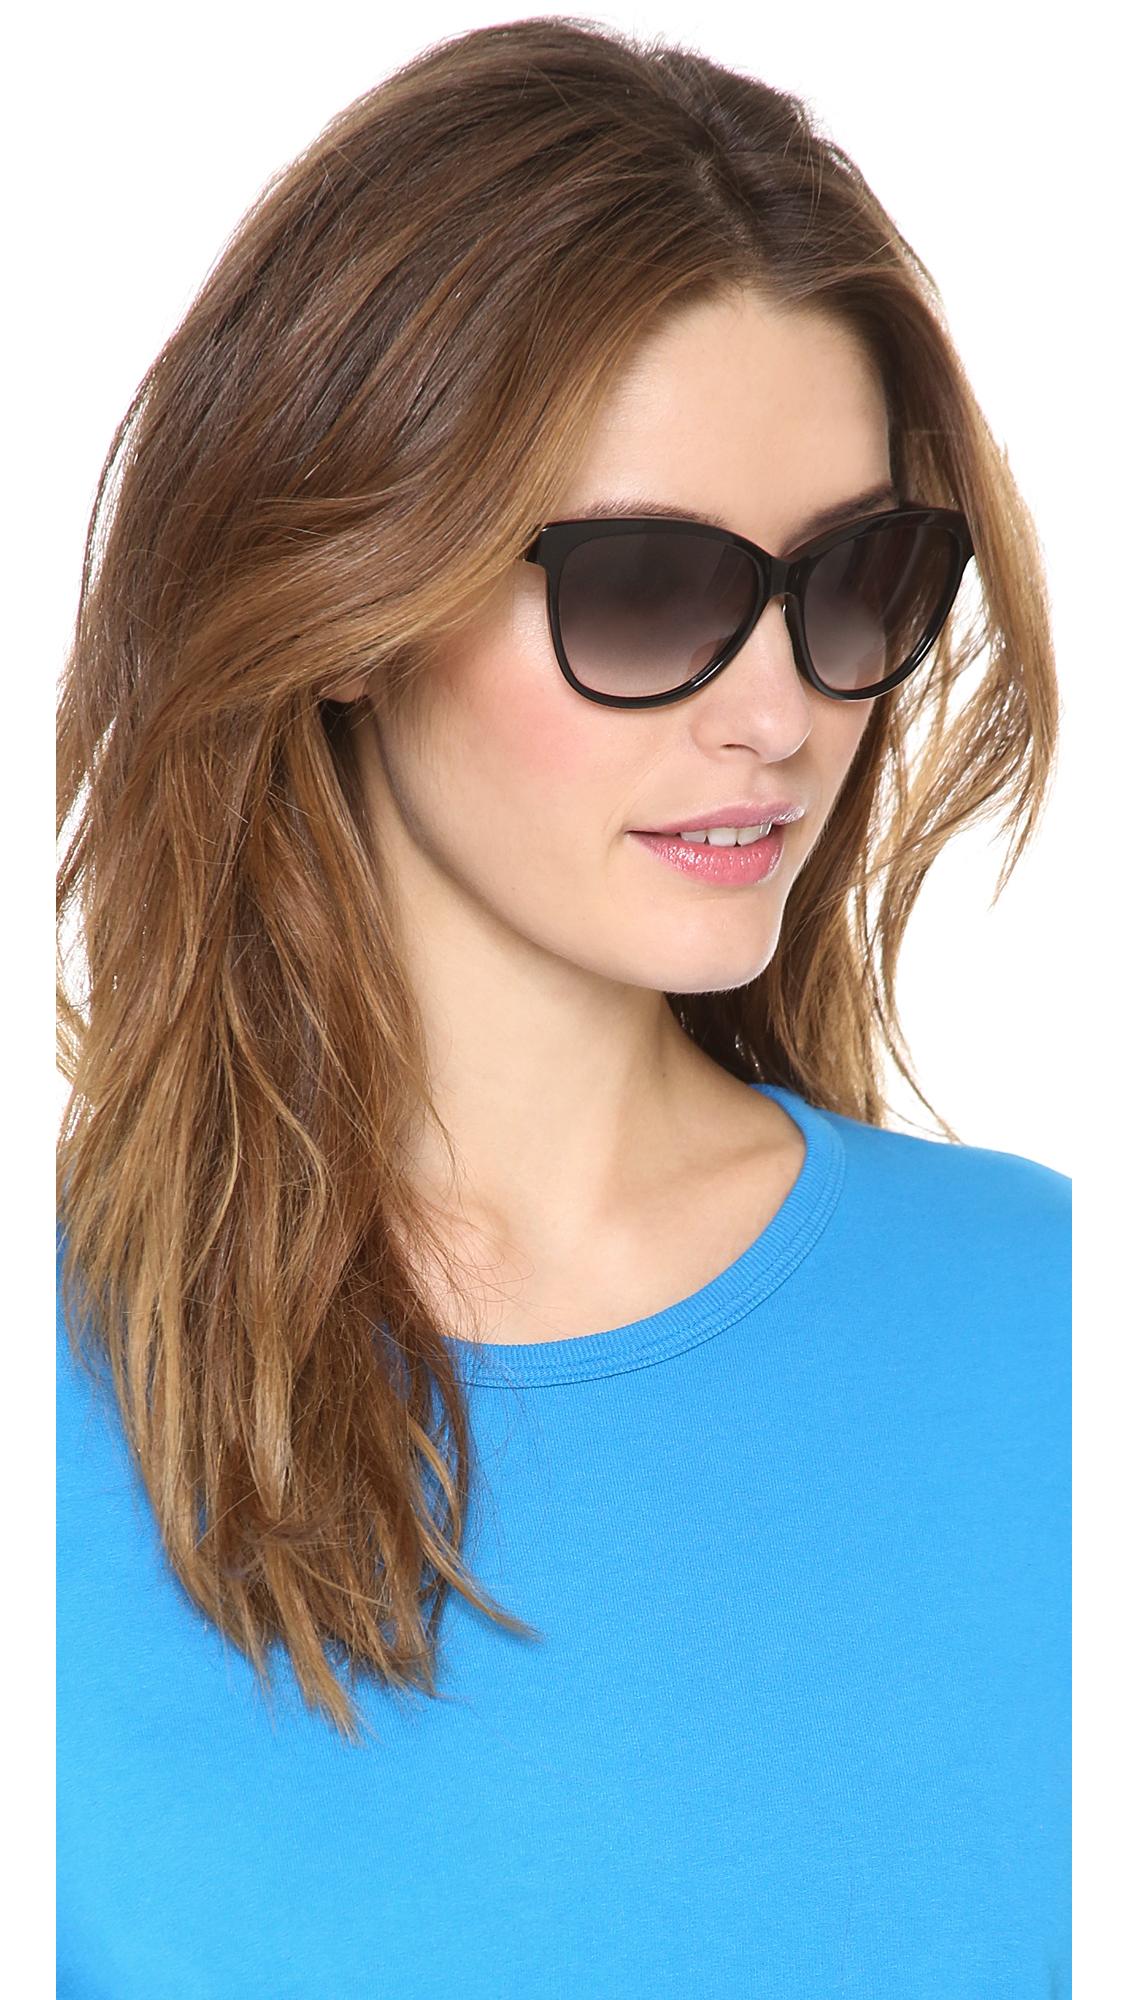 e3f063198493 Marc By Marc Jacobs Cat Eye Sunglasses - Havana/Brown Gradient in ...